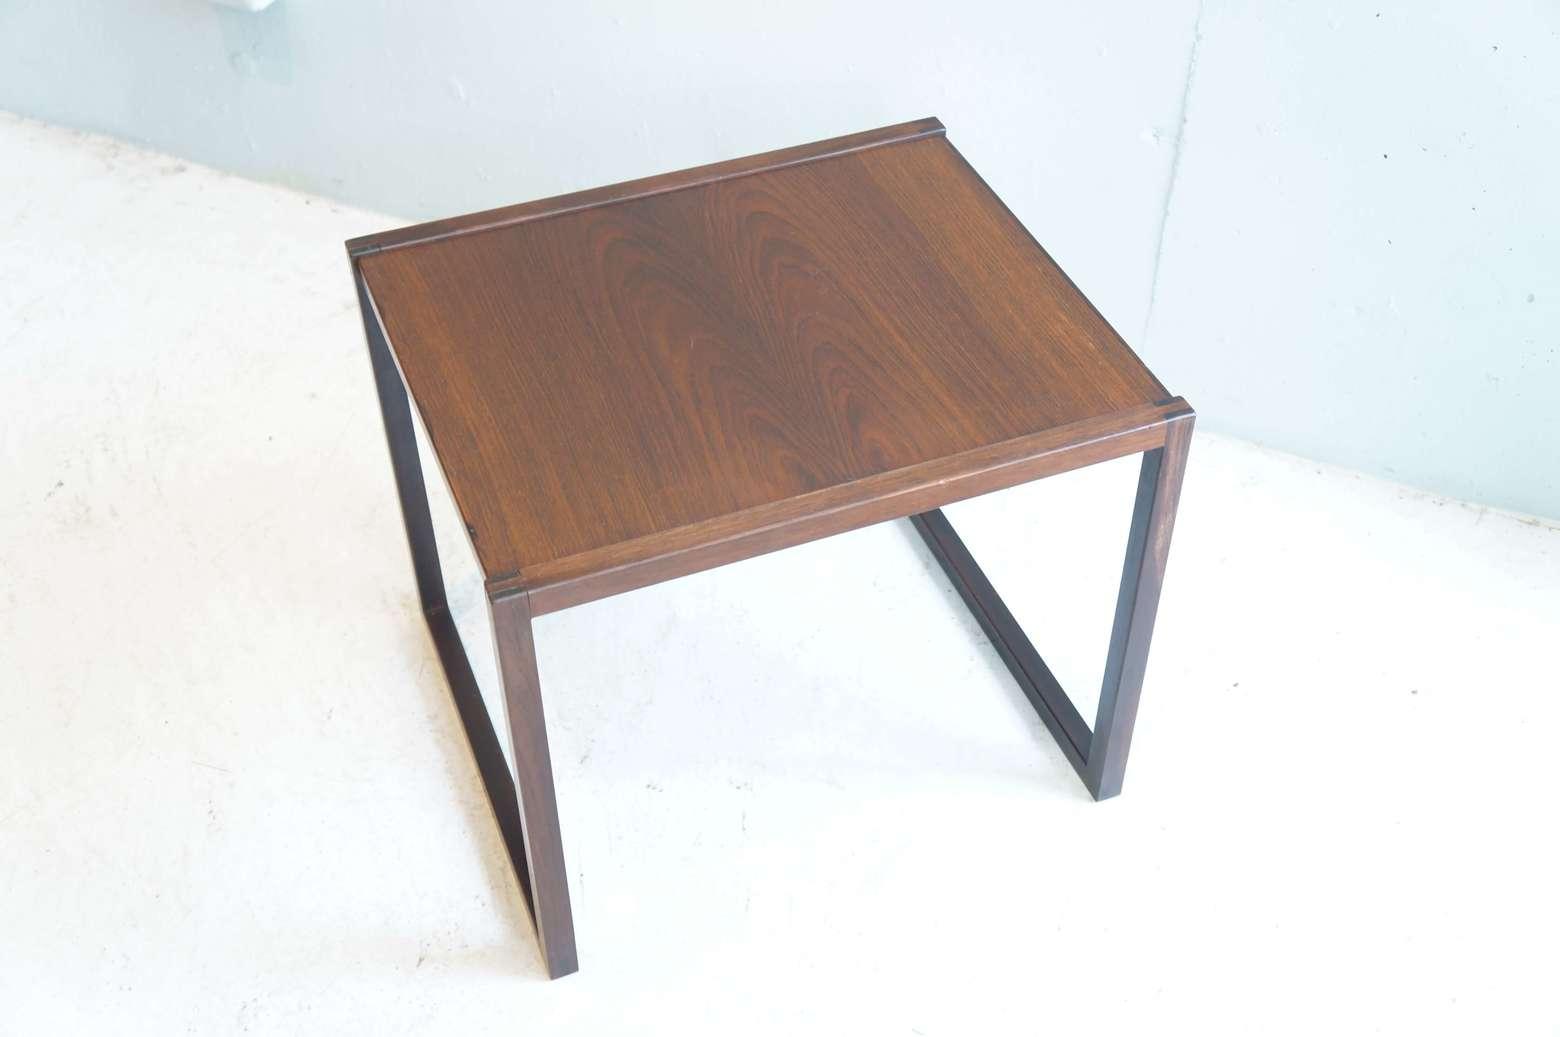 VILDBJERG MØBELFABRIK DESIGN BY KAI KRISTIANSEN ROSE WOOD NESTING TABLE ONE PIECE / カイ クリスチャンセン デザイン ネストテーブルのお買取をいたしました。